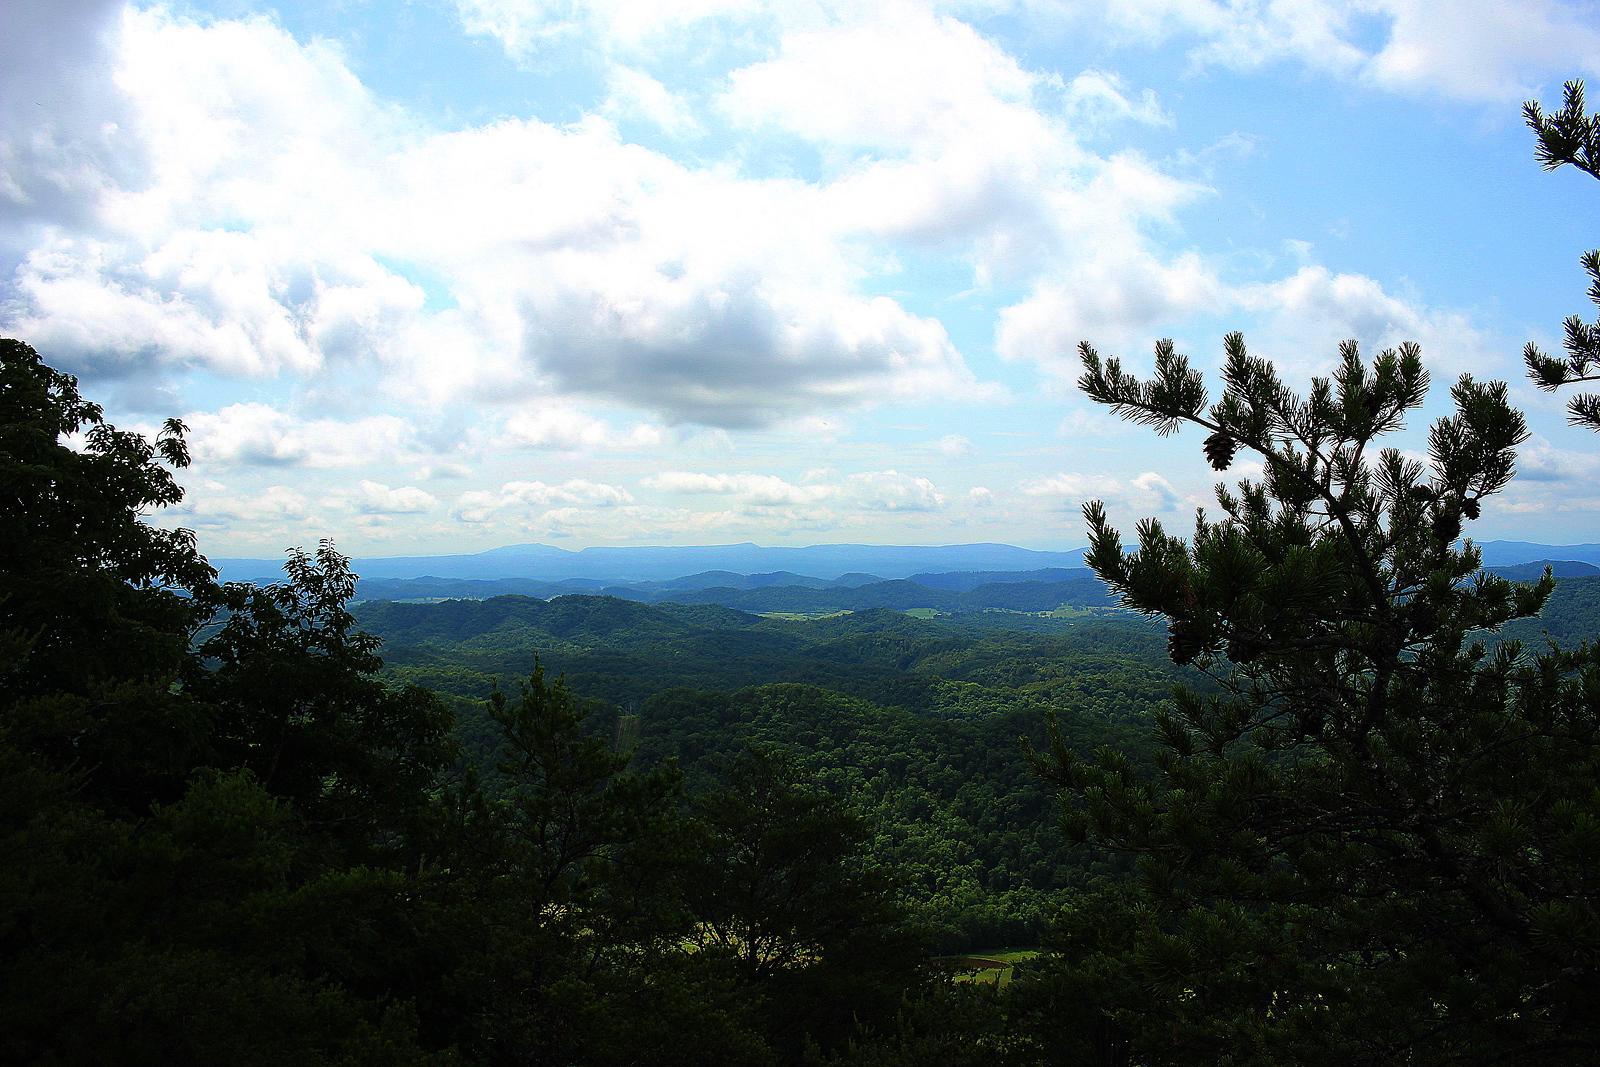 View from Little War Gap Tower Site